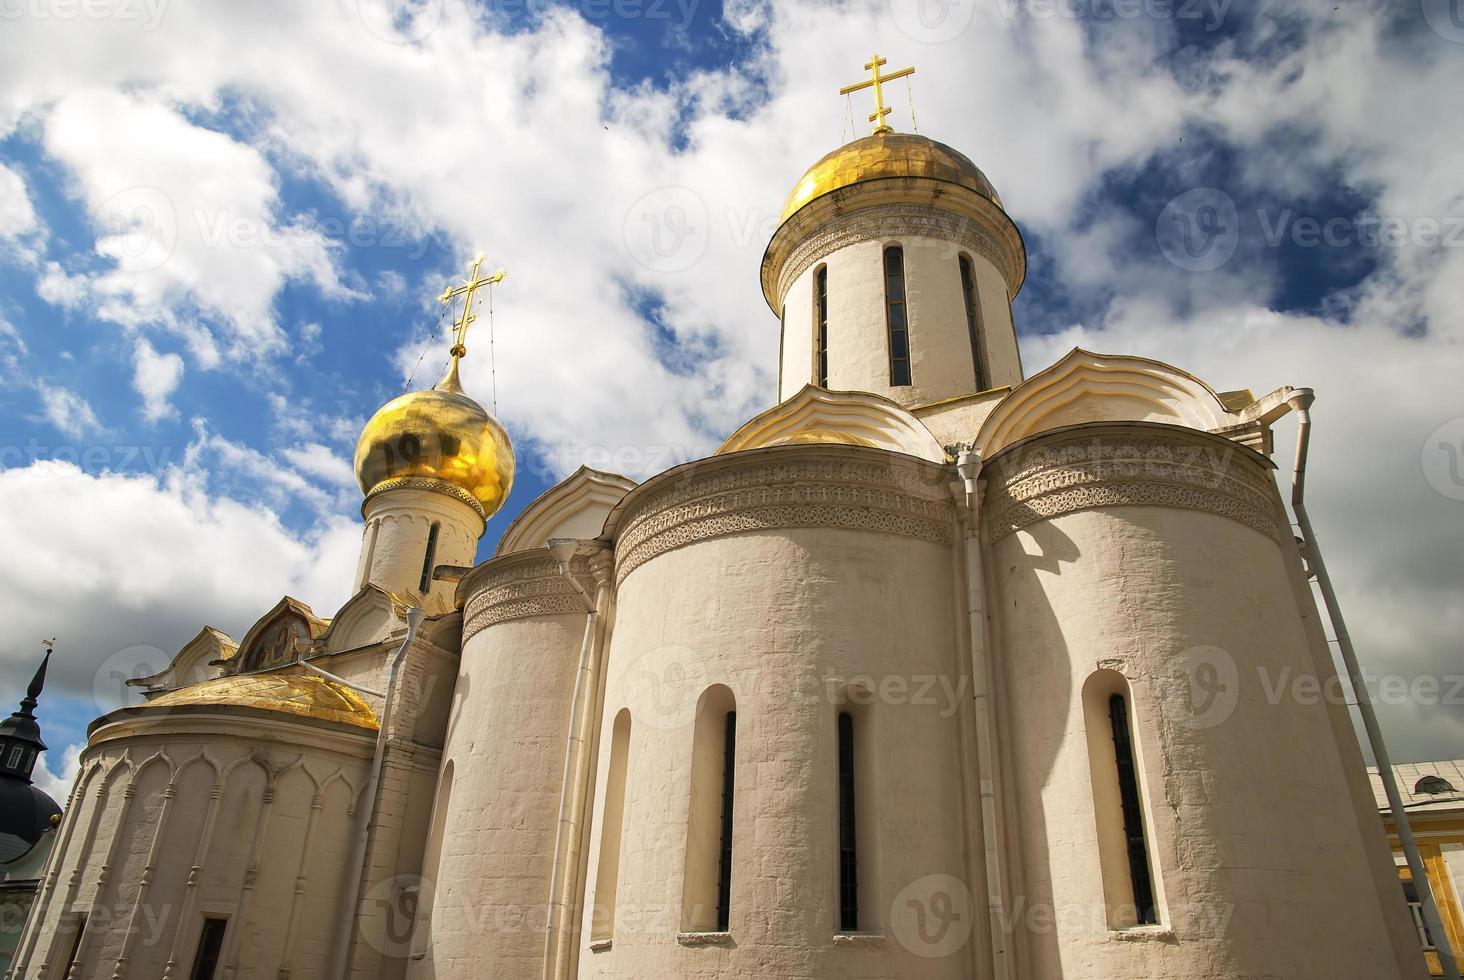 Trinity Cathedral in de Trinity Lavra van St. sergius foto